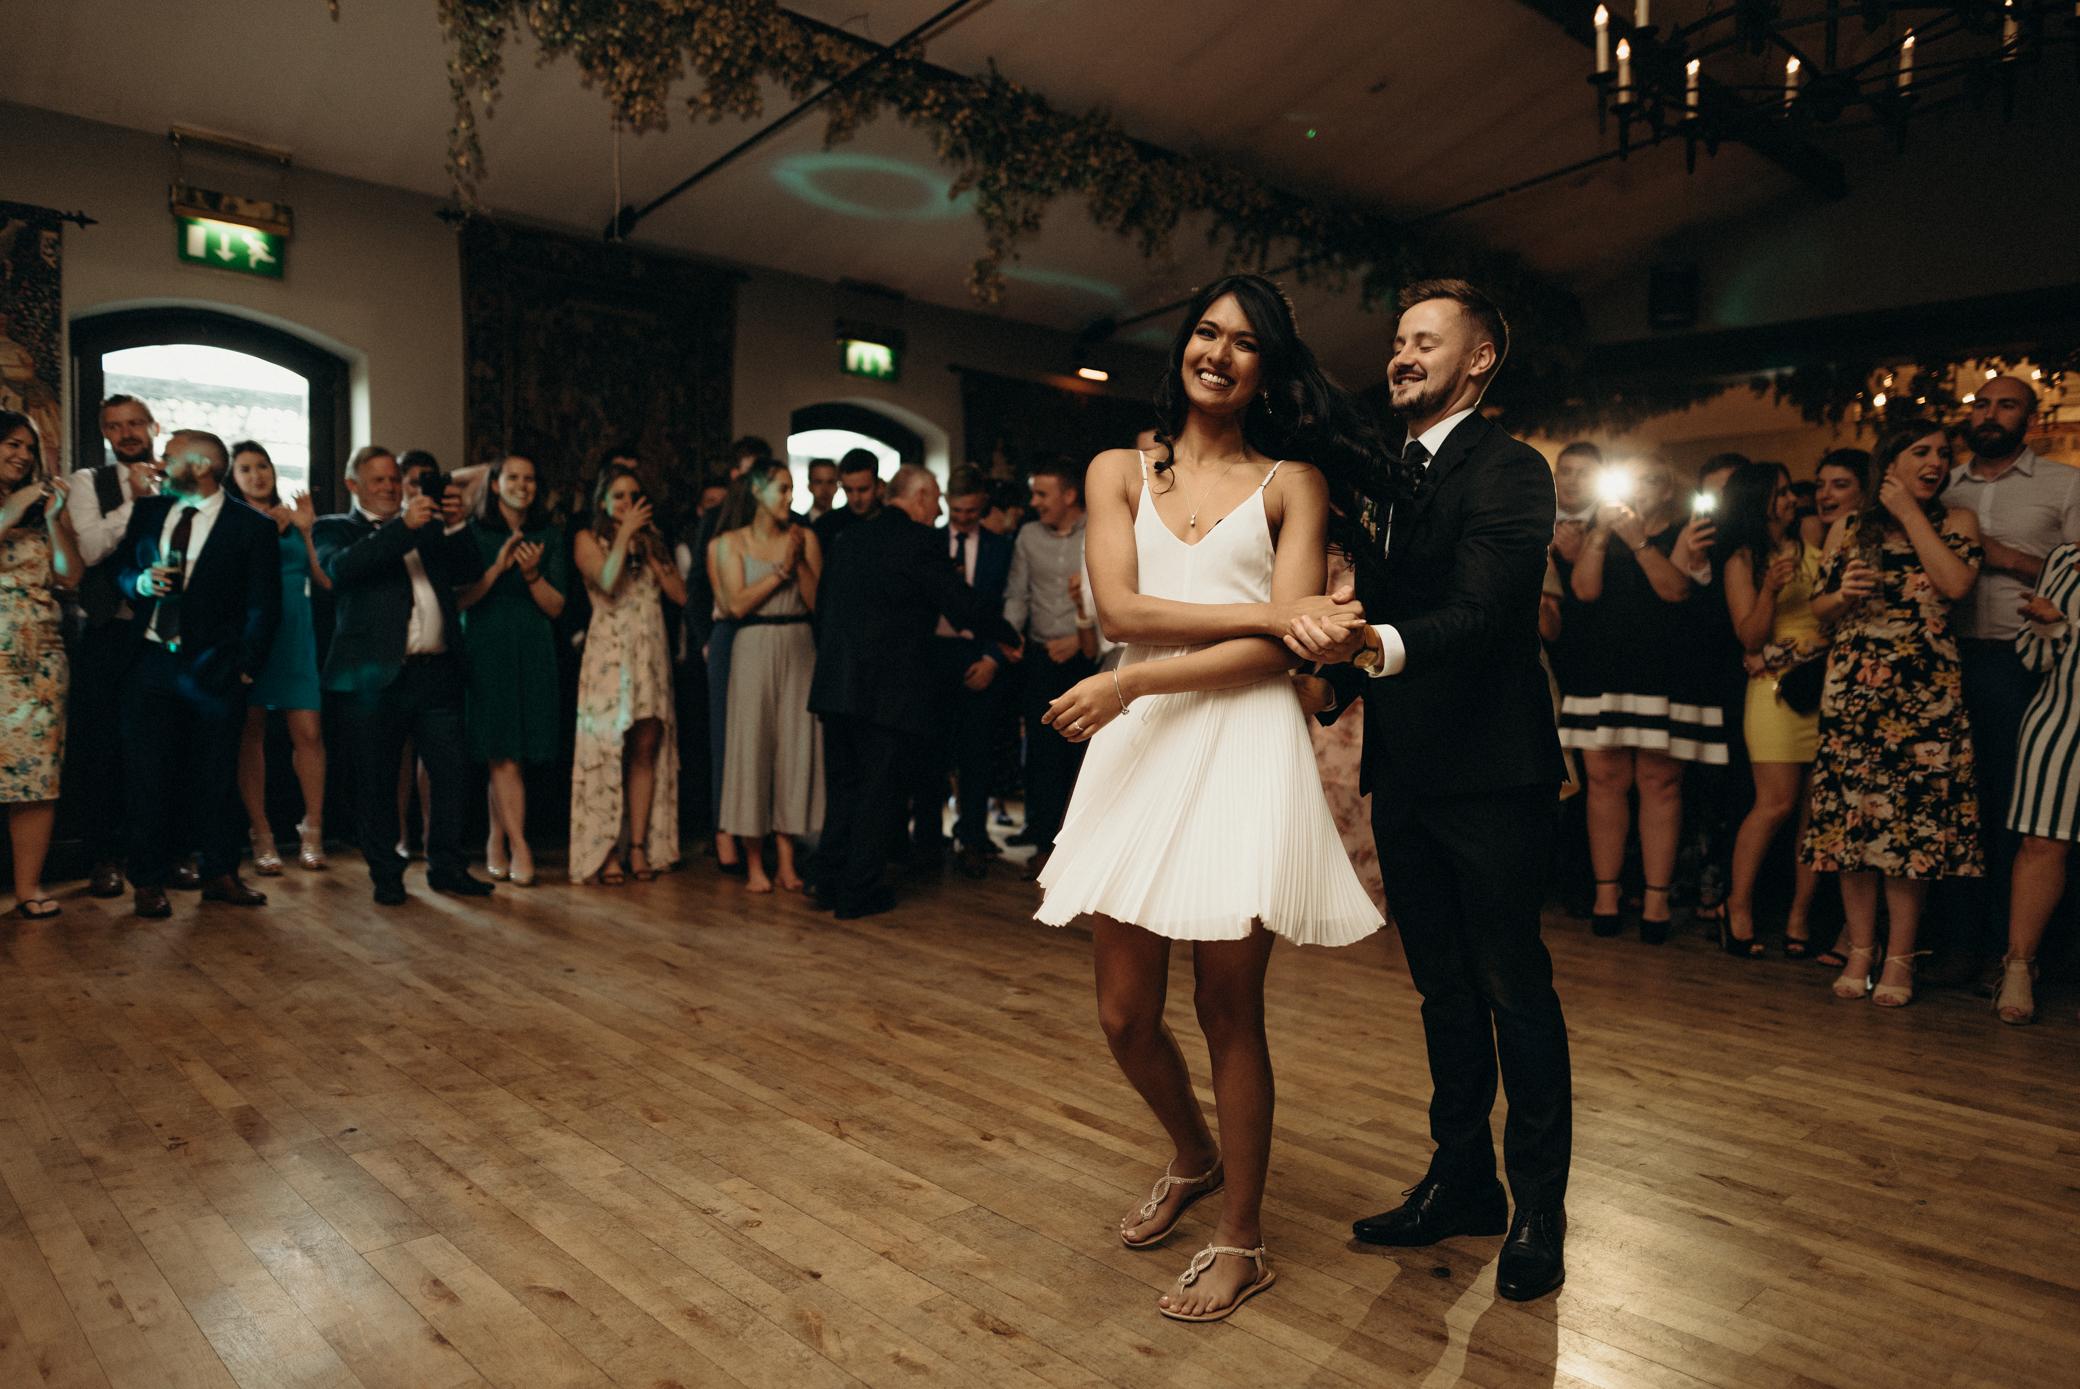 Alan&Naz- Barberstown Castle Wedding - Wedding photographer Ireland-208.jpg